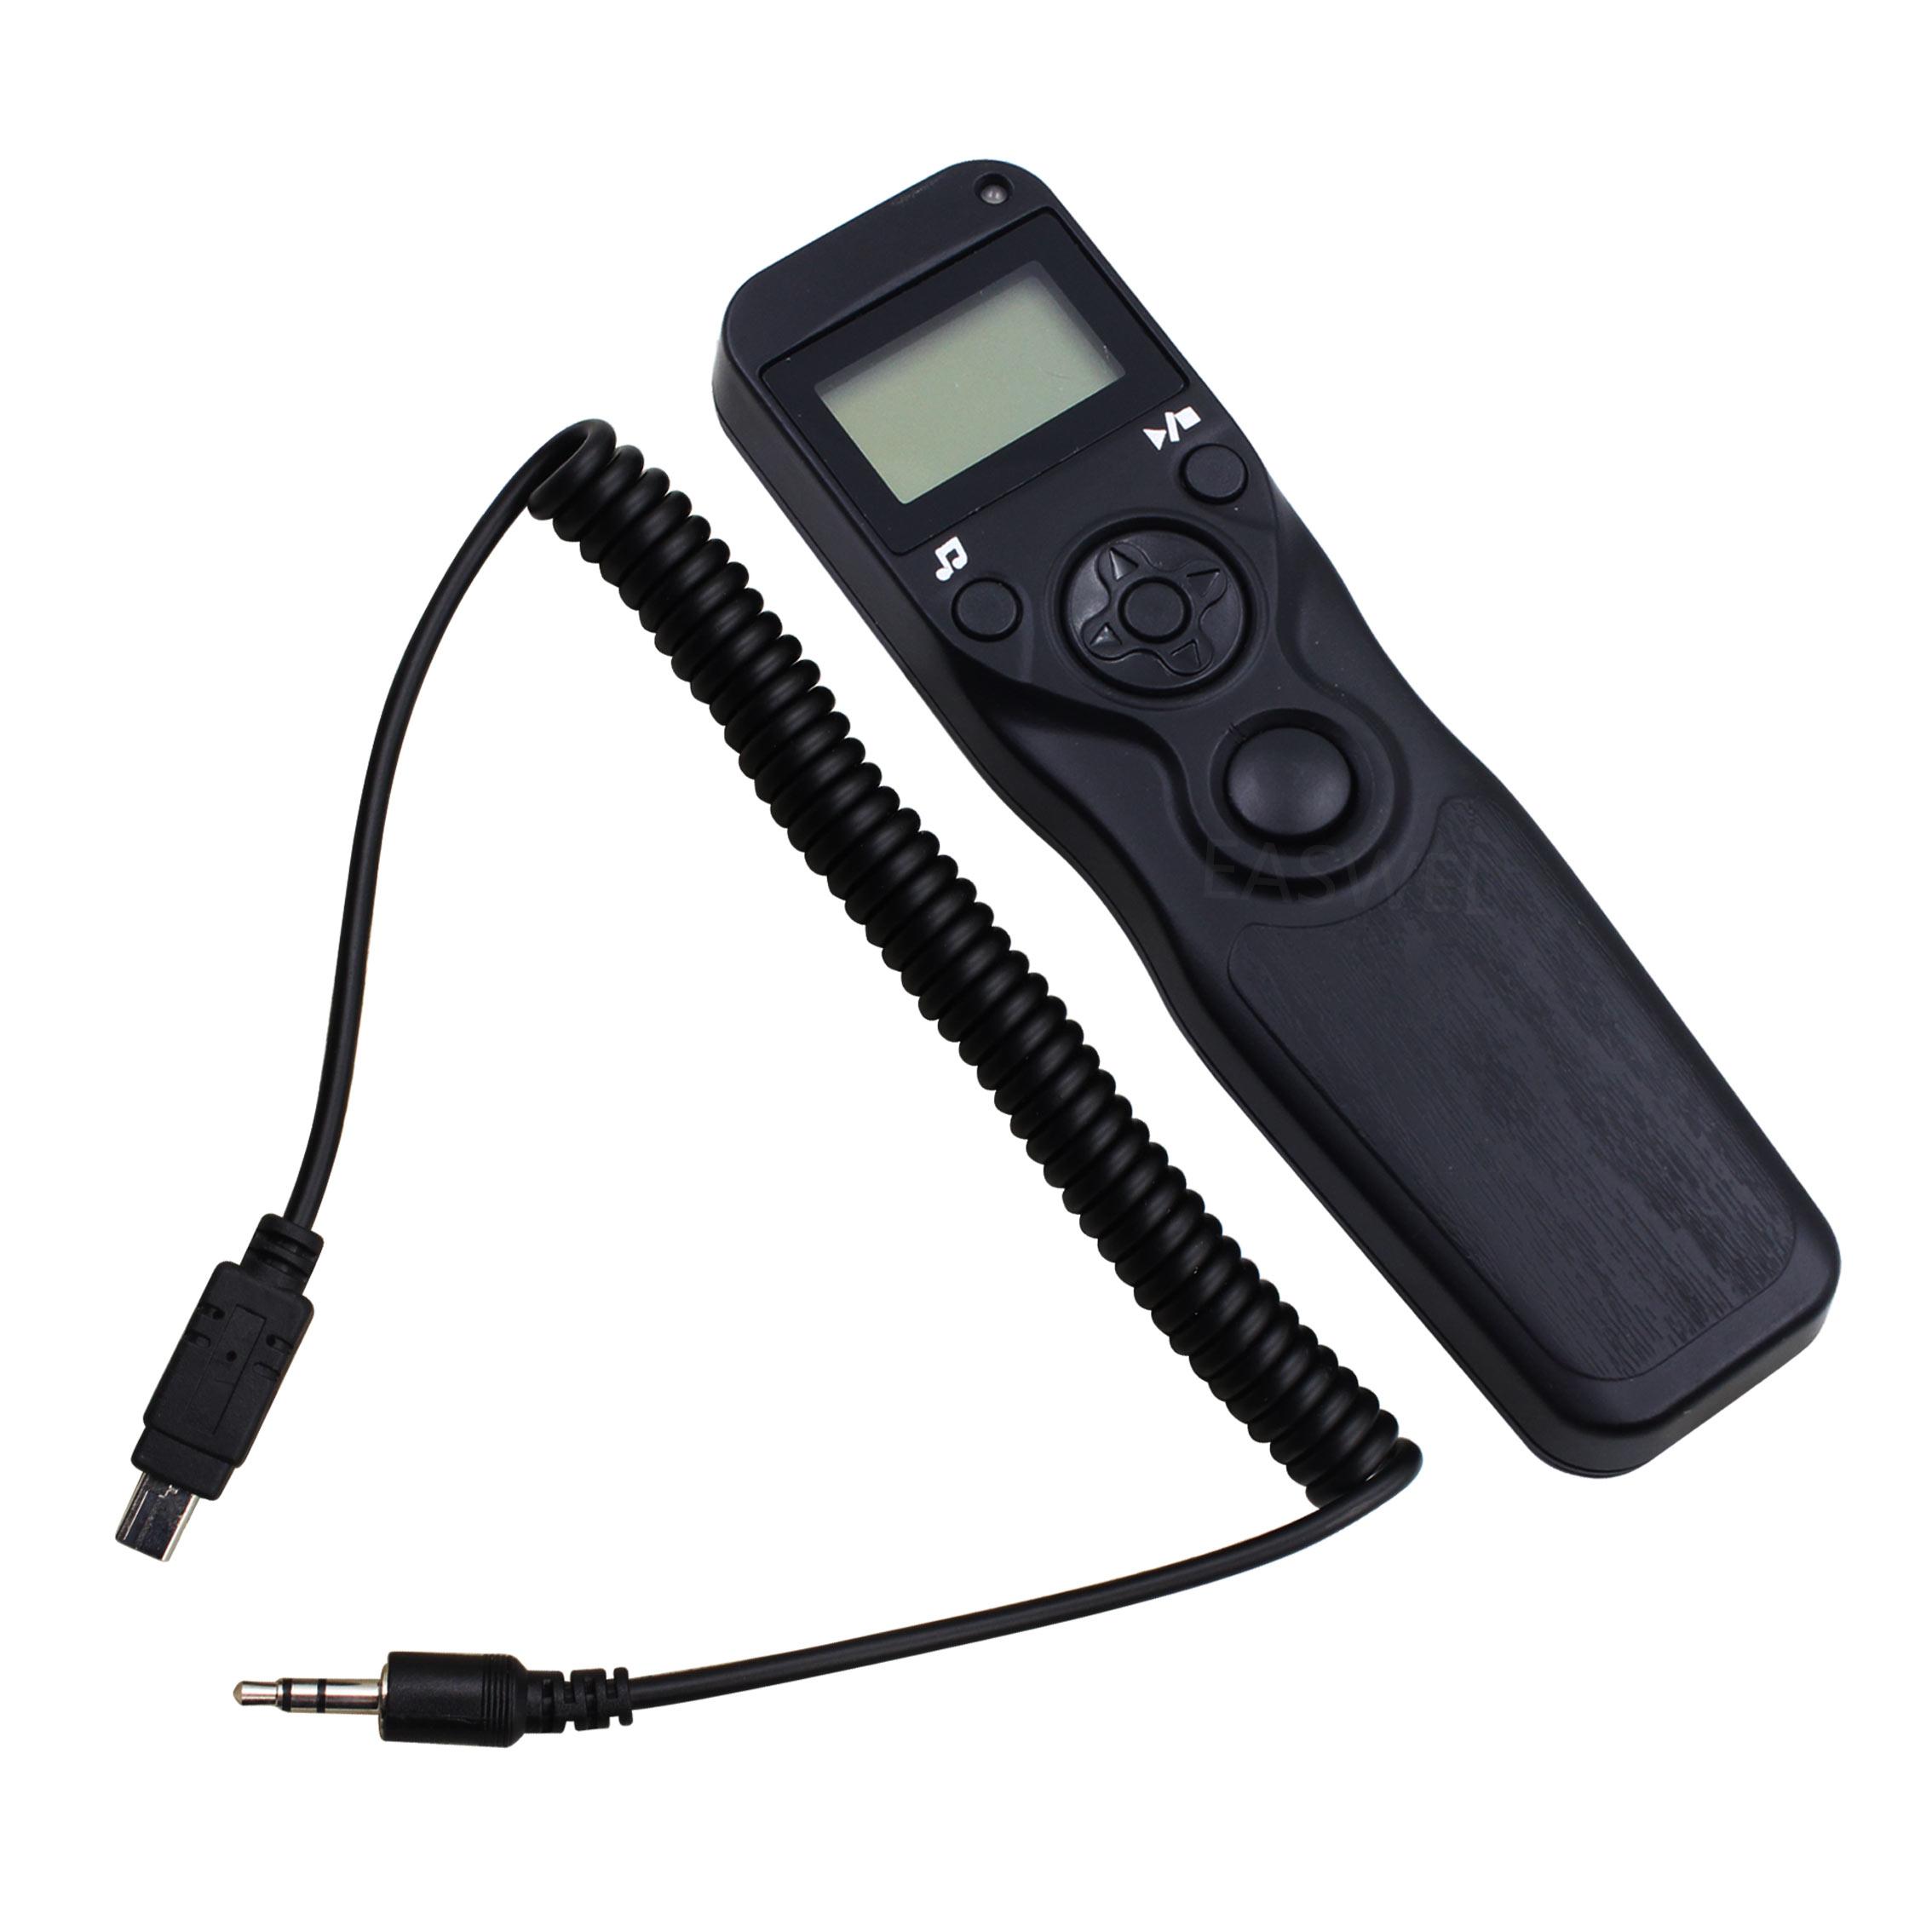 MC-DC2 LCD Timer Remote Shutter Cord for D750 D610 D3300 D5500 D5600